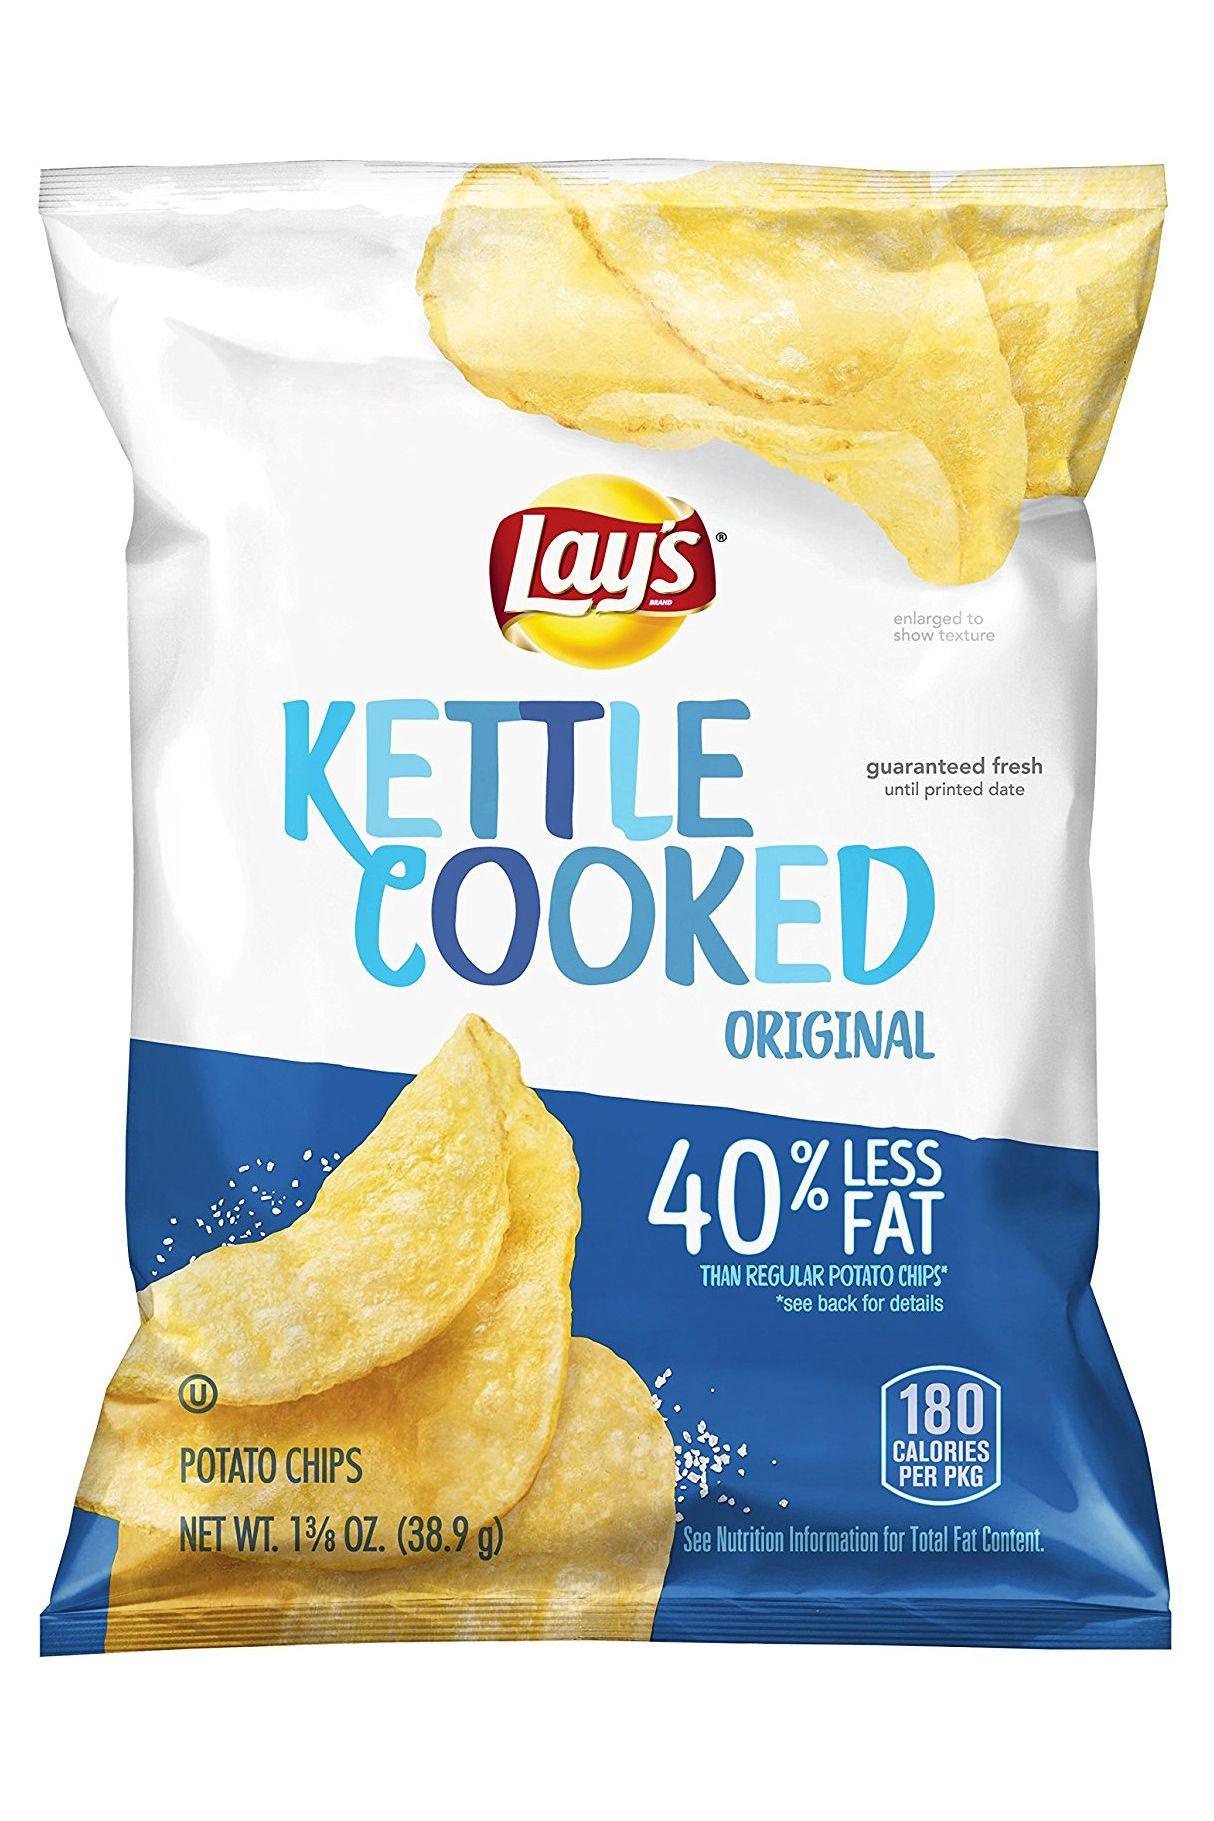 Salty Snacks Healthier Than Potato Chips